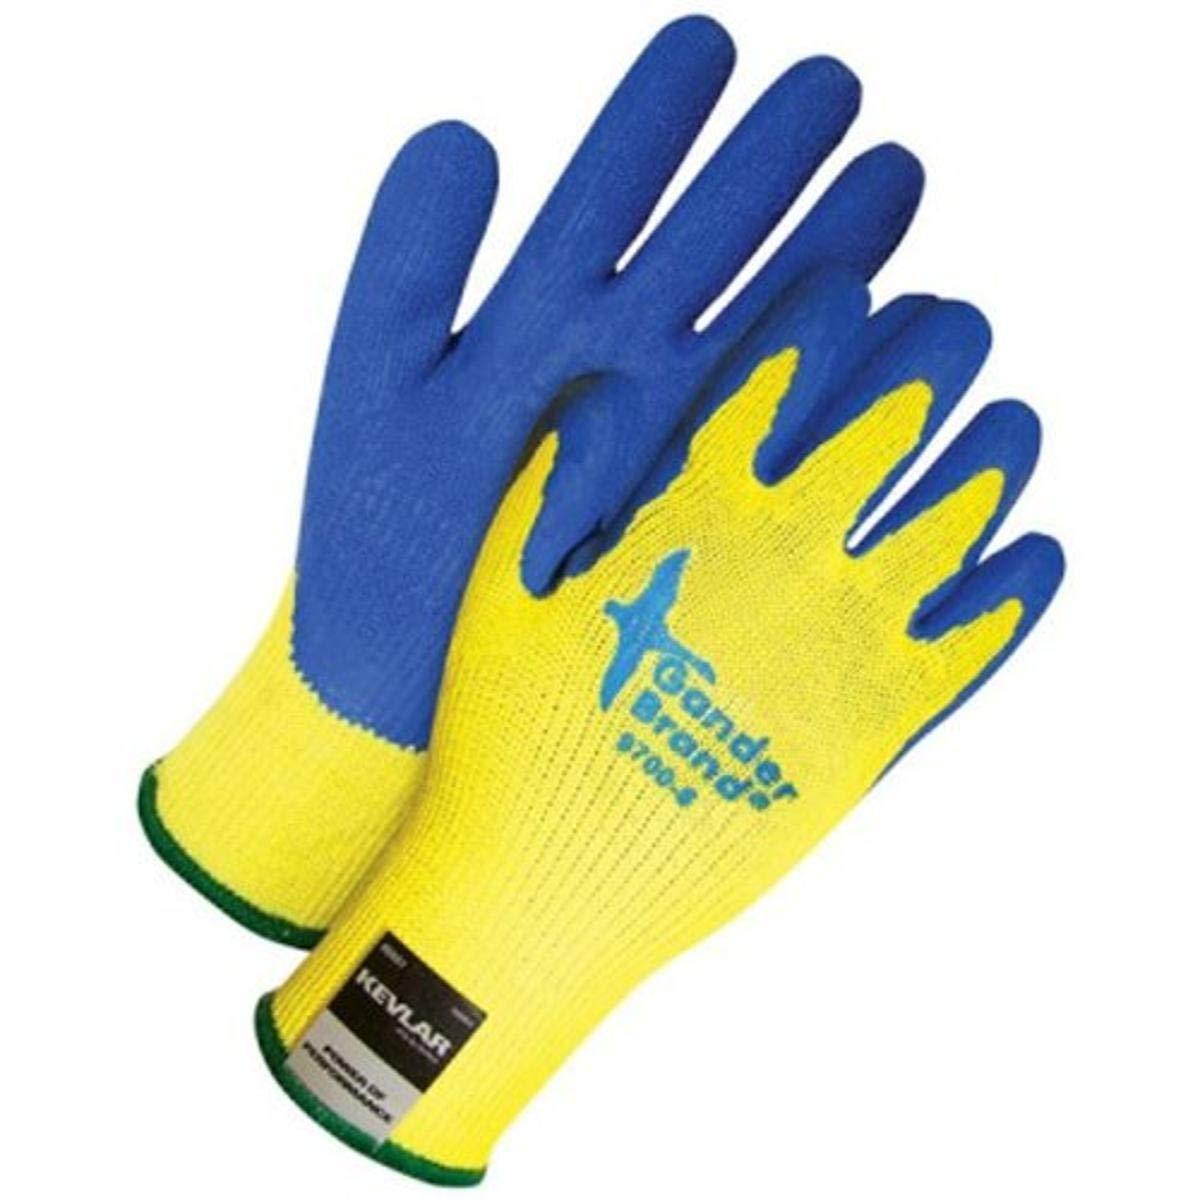 Bob Dale 99-1-9700-9 Seamless Knit Glove, Kevlar Cut Level 4 Crinkle Latex Palm, Size 9, Blue/Yellow